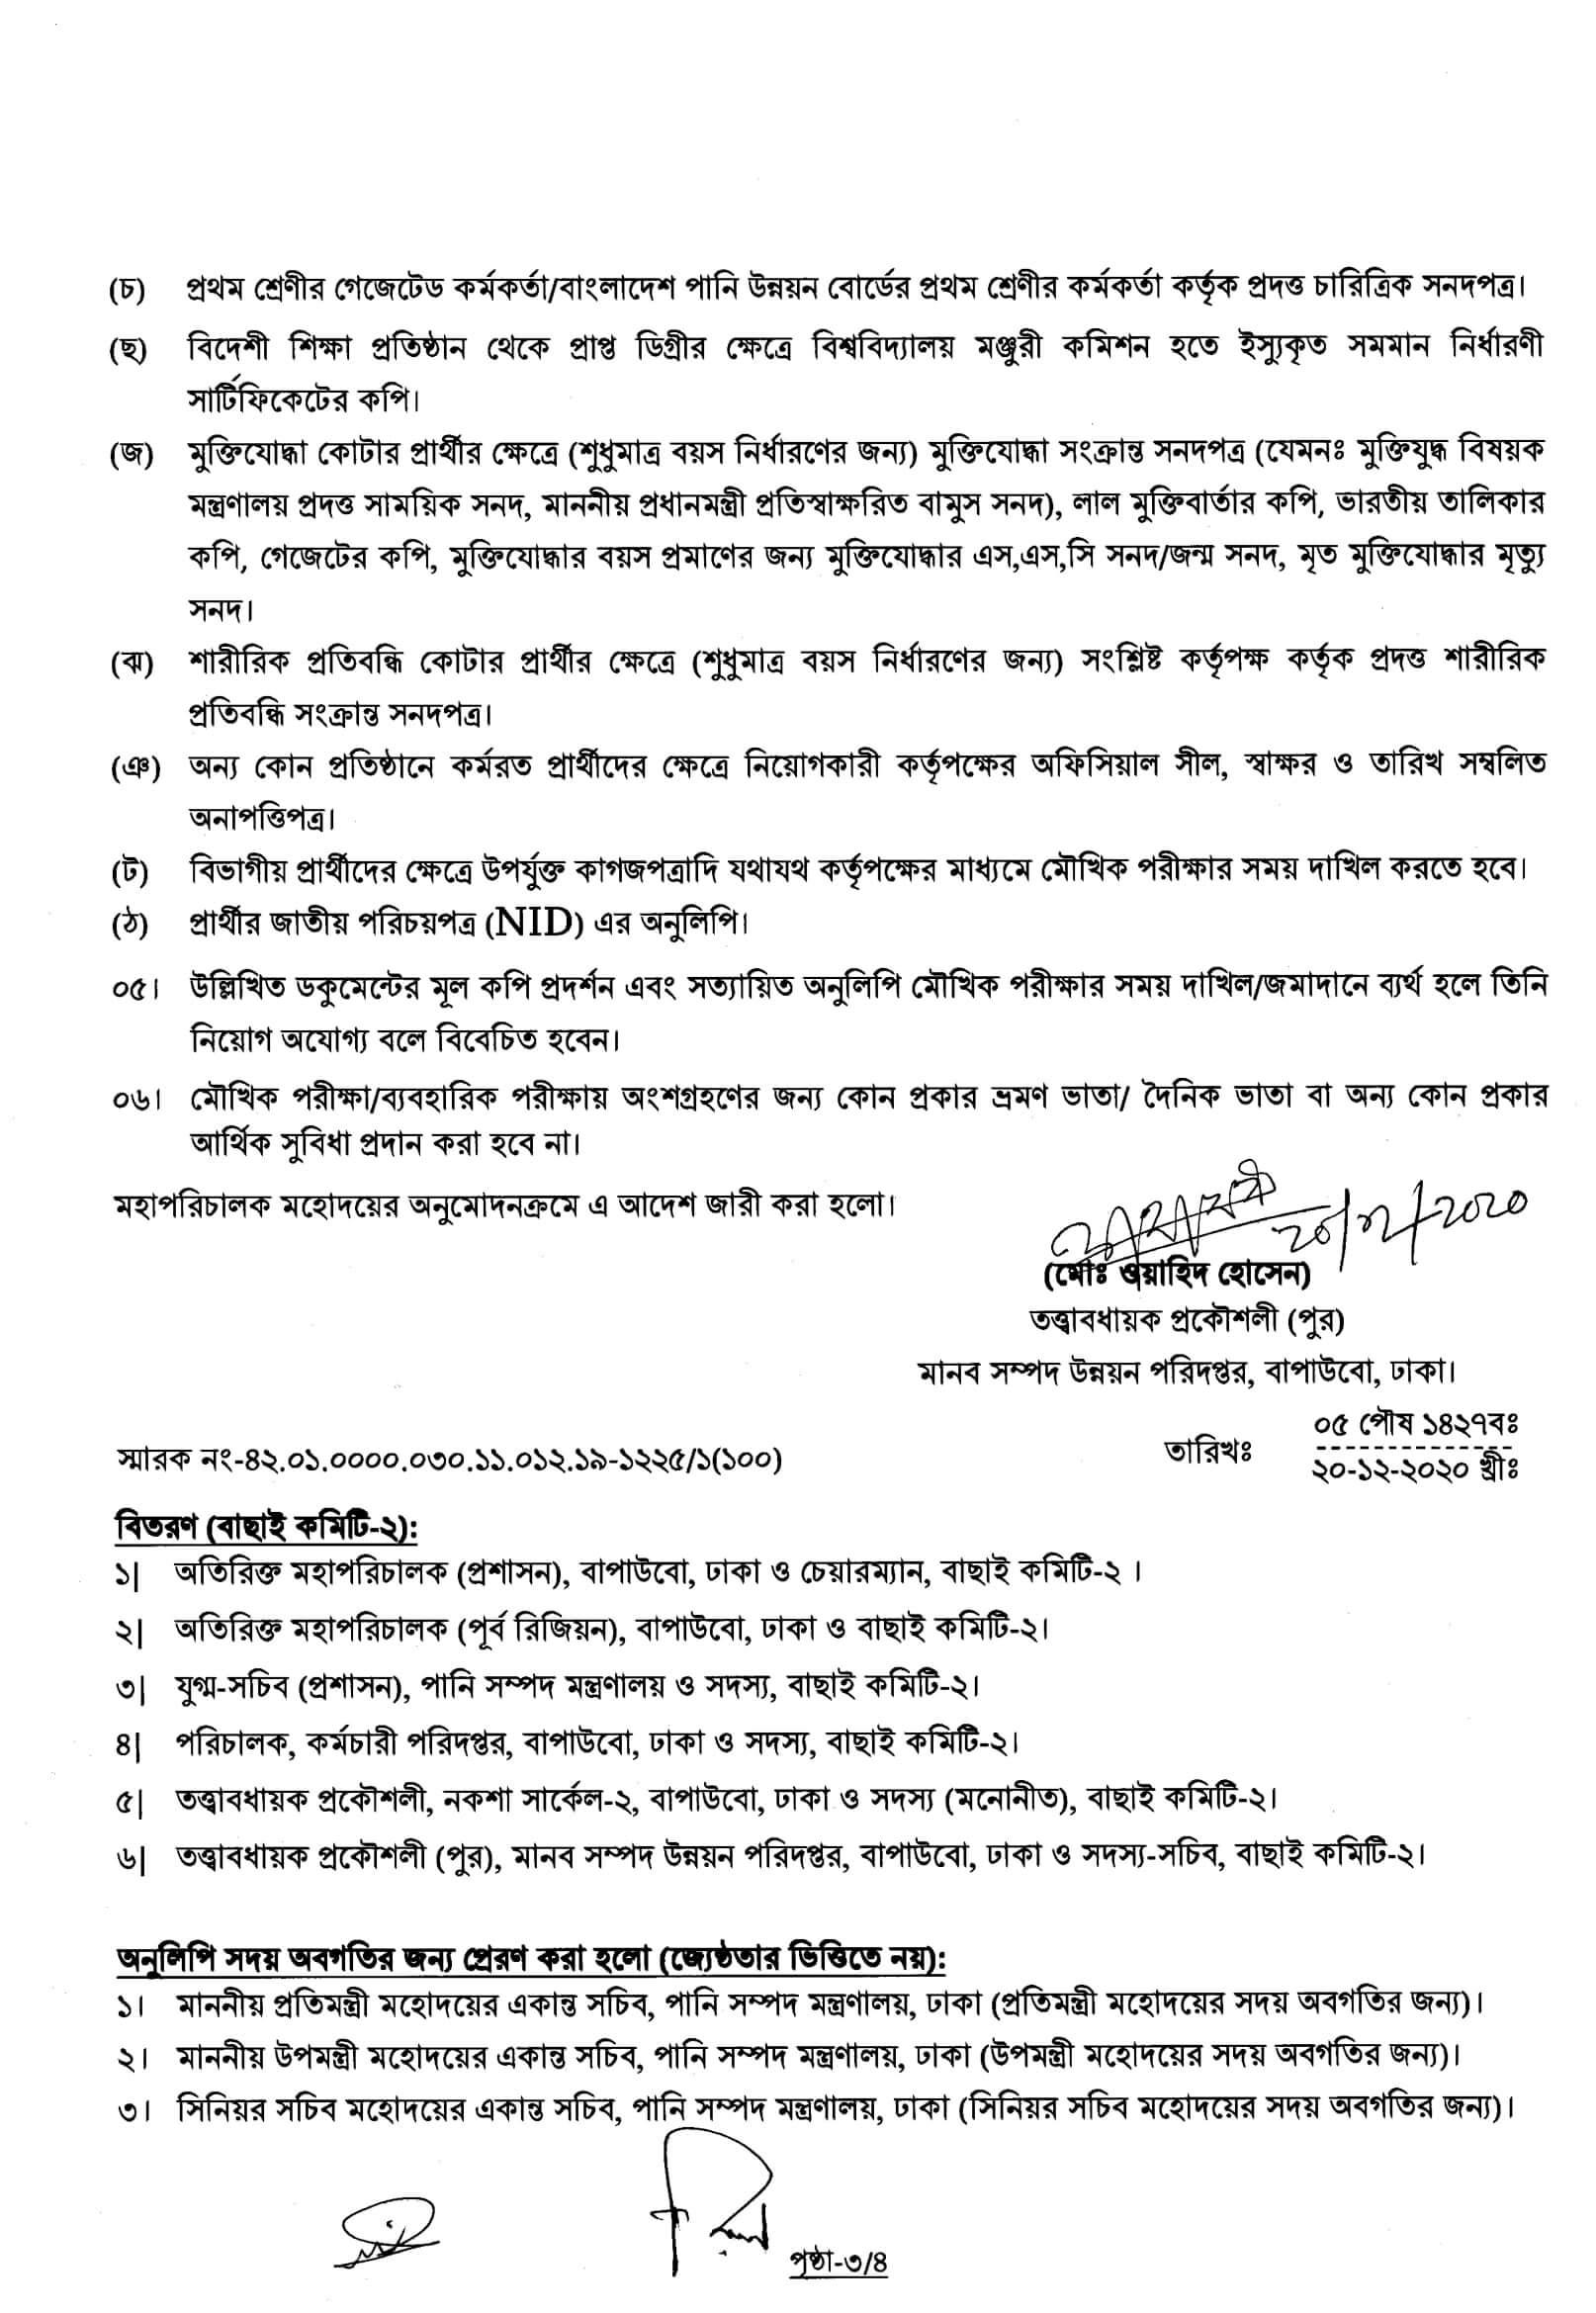 bwdb job viva exam date 2020